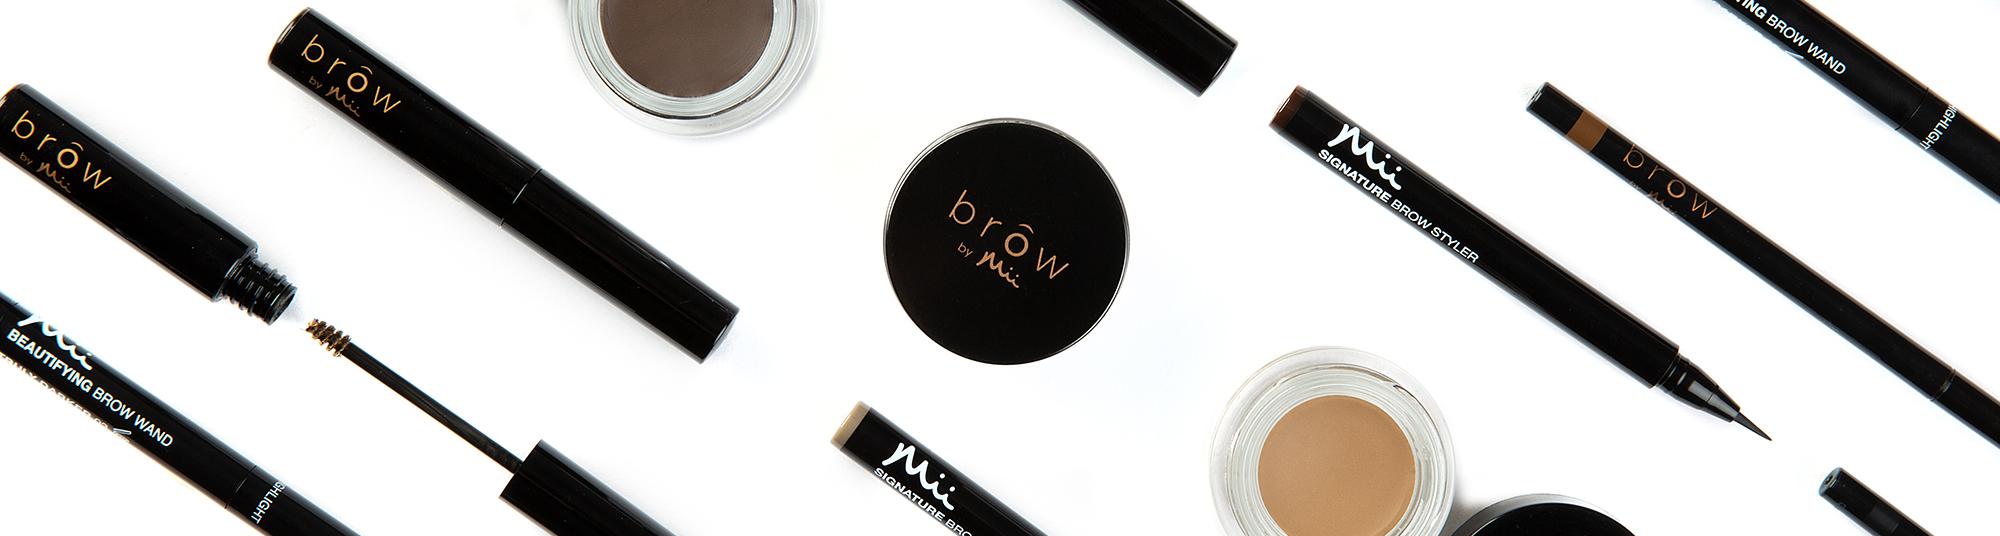 Mii Cosmetics Brow Category